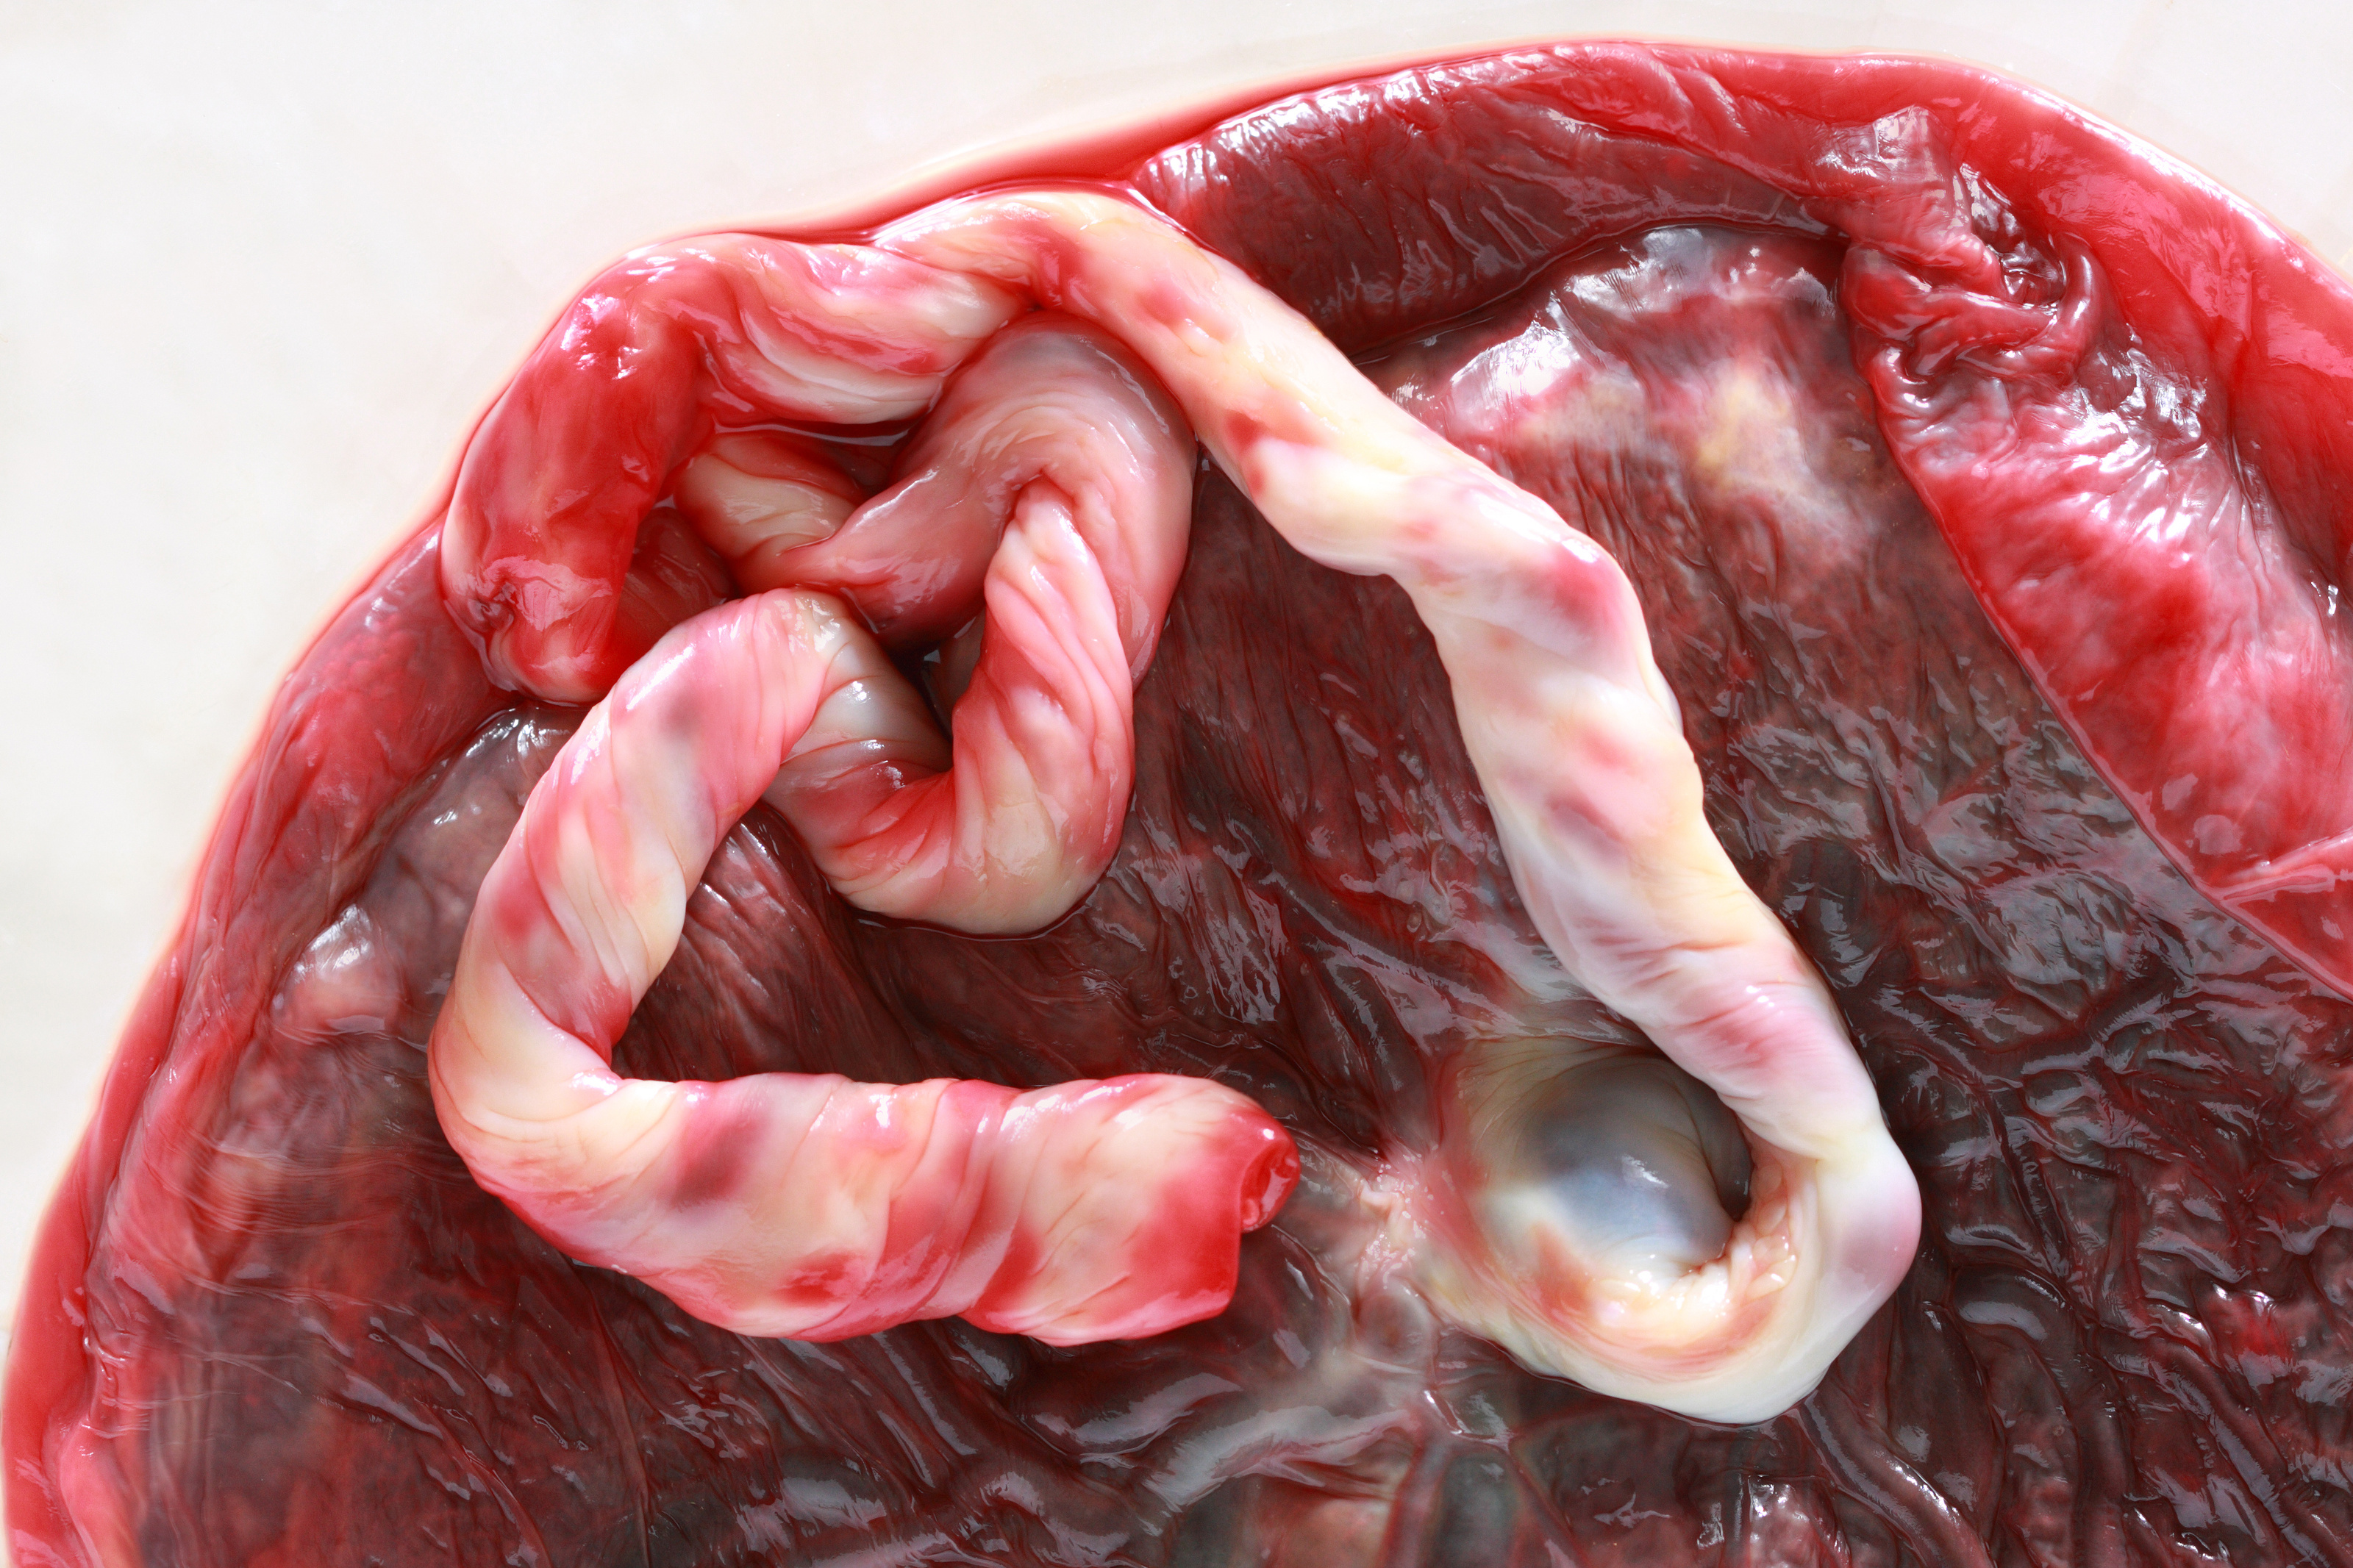 Close up of a fresh human placenta